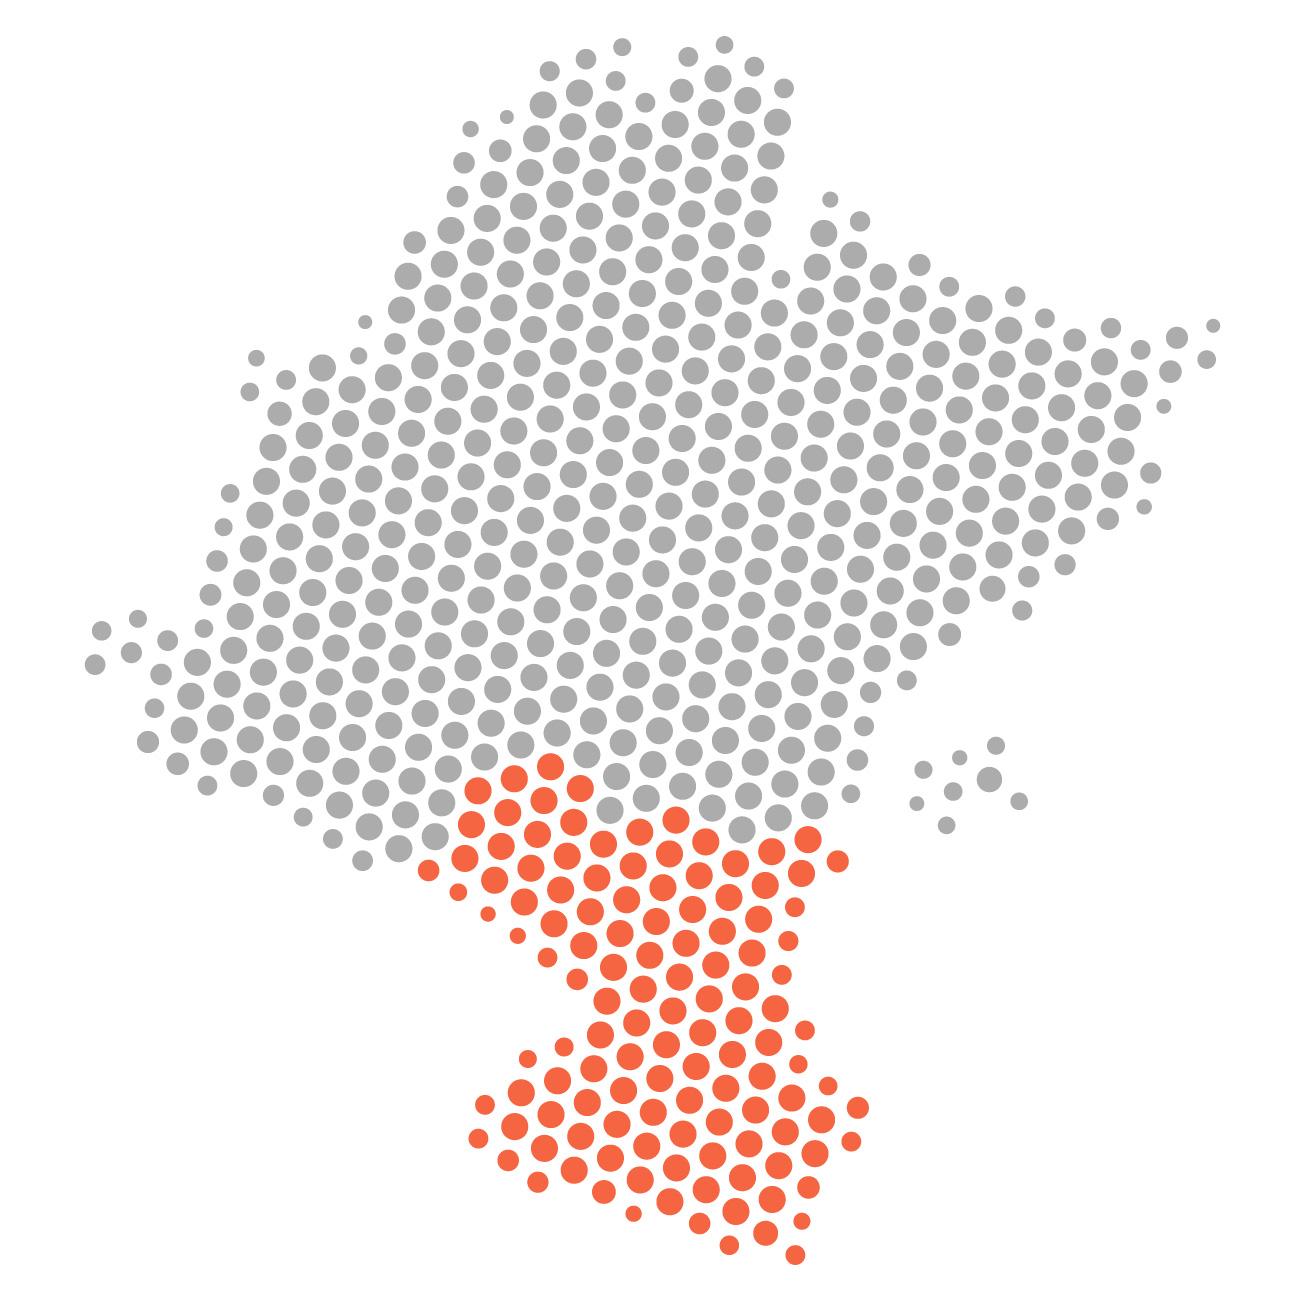 https://www.atrapaelnorte.com/wp-content/uploads/2021/02/mapa-ribera_1.jpg